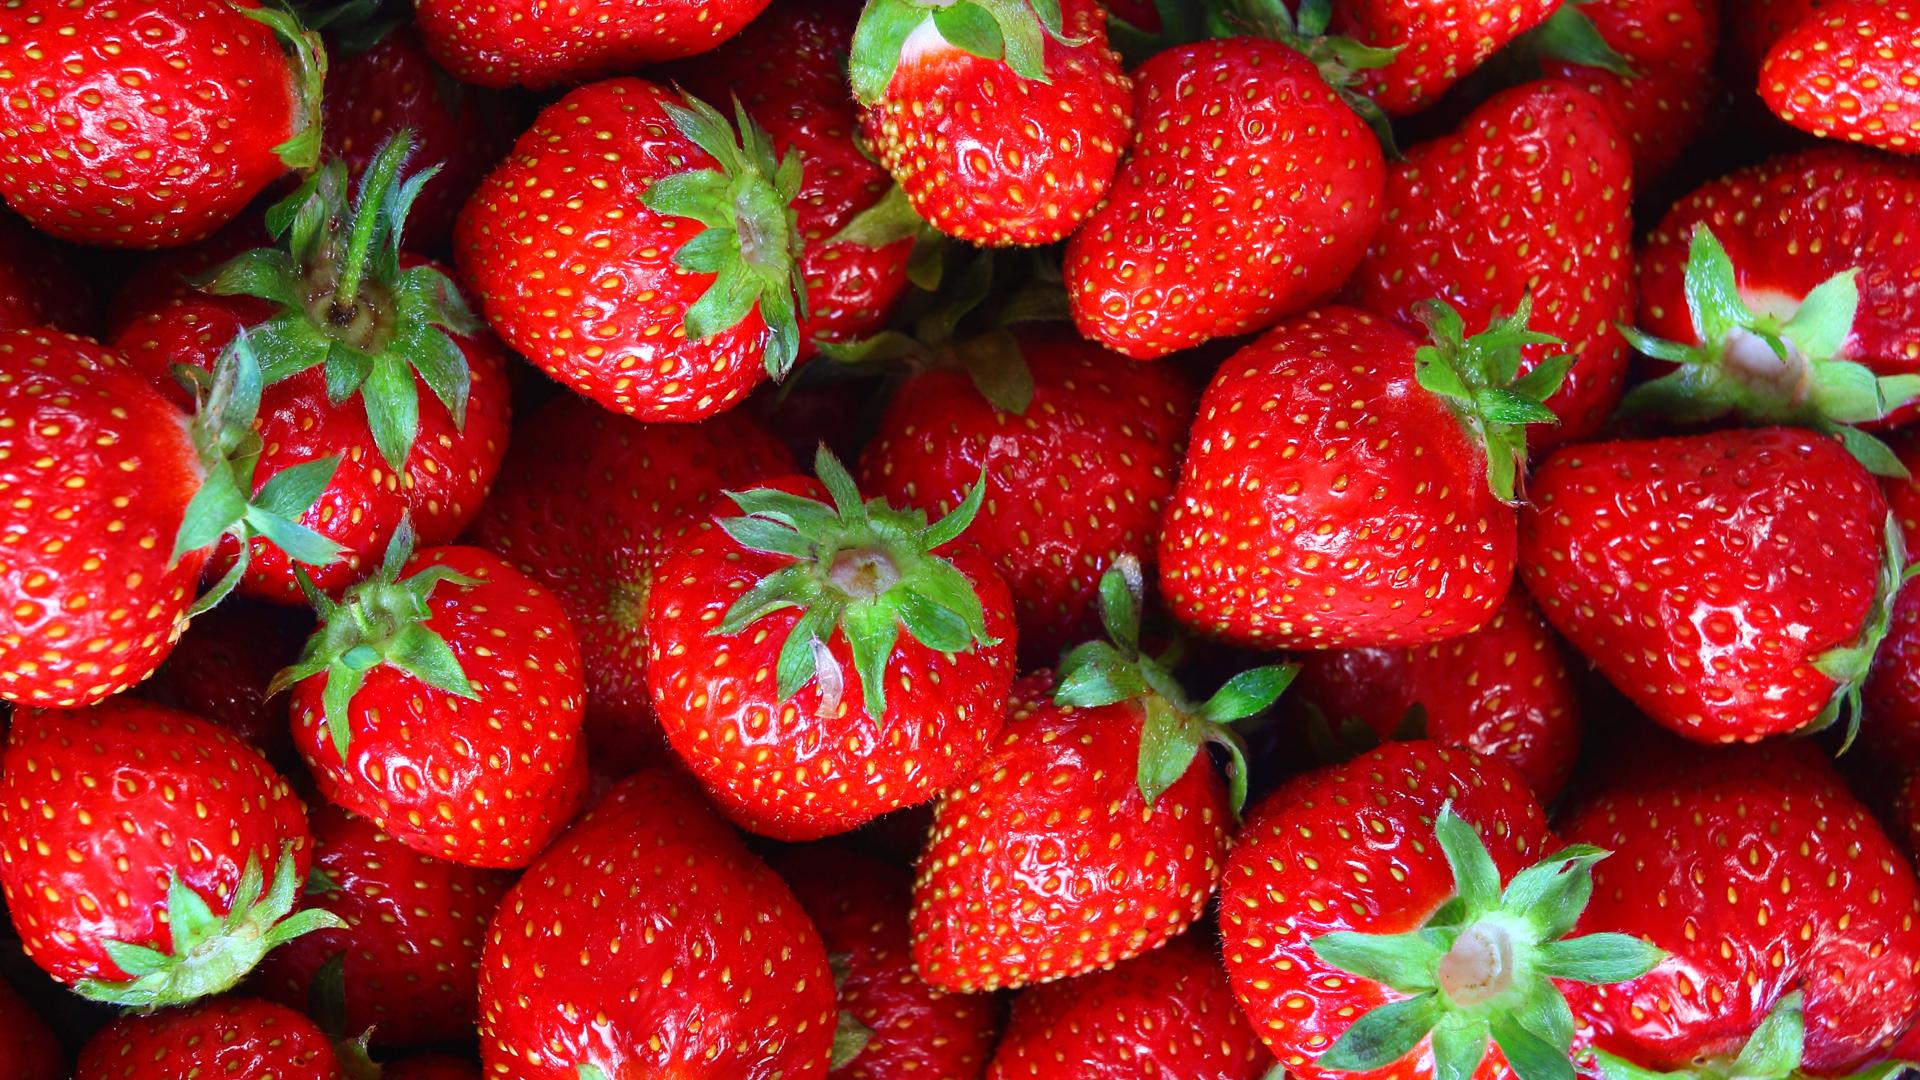 How to Hull Fresh Strawberries - HealthiNation